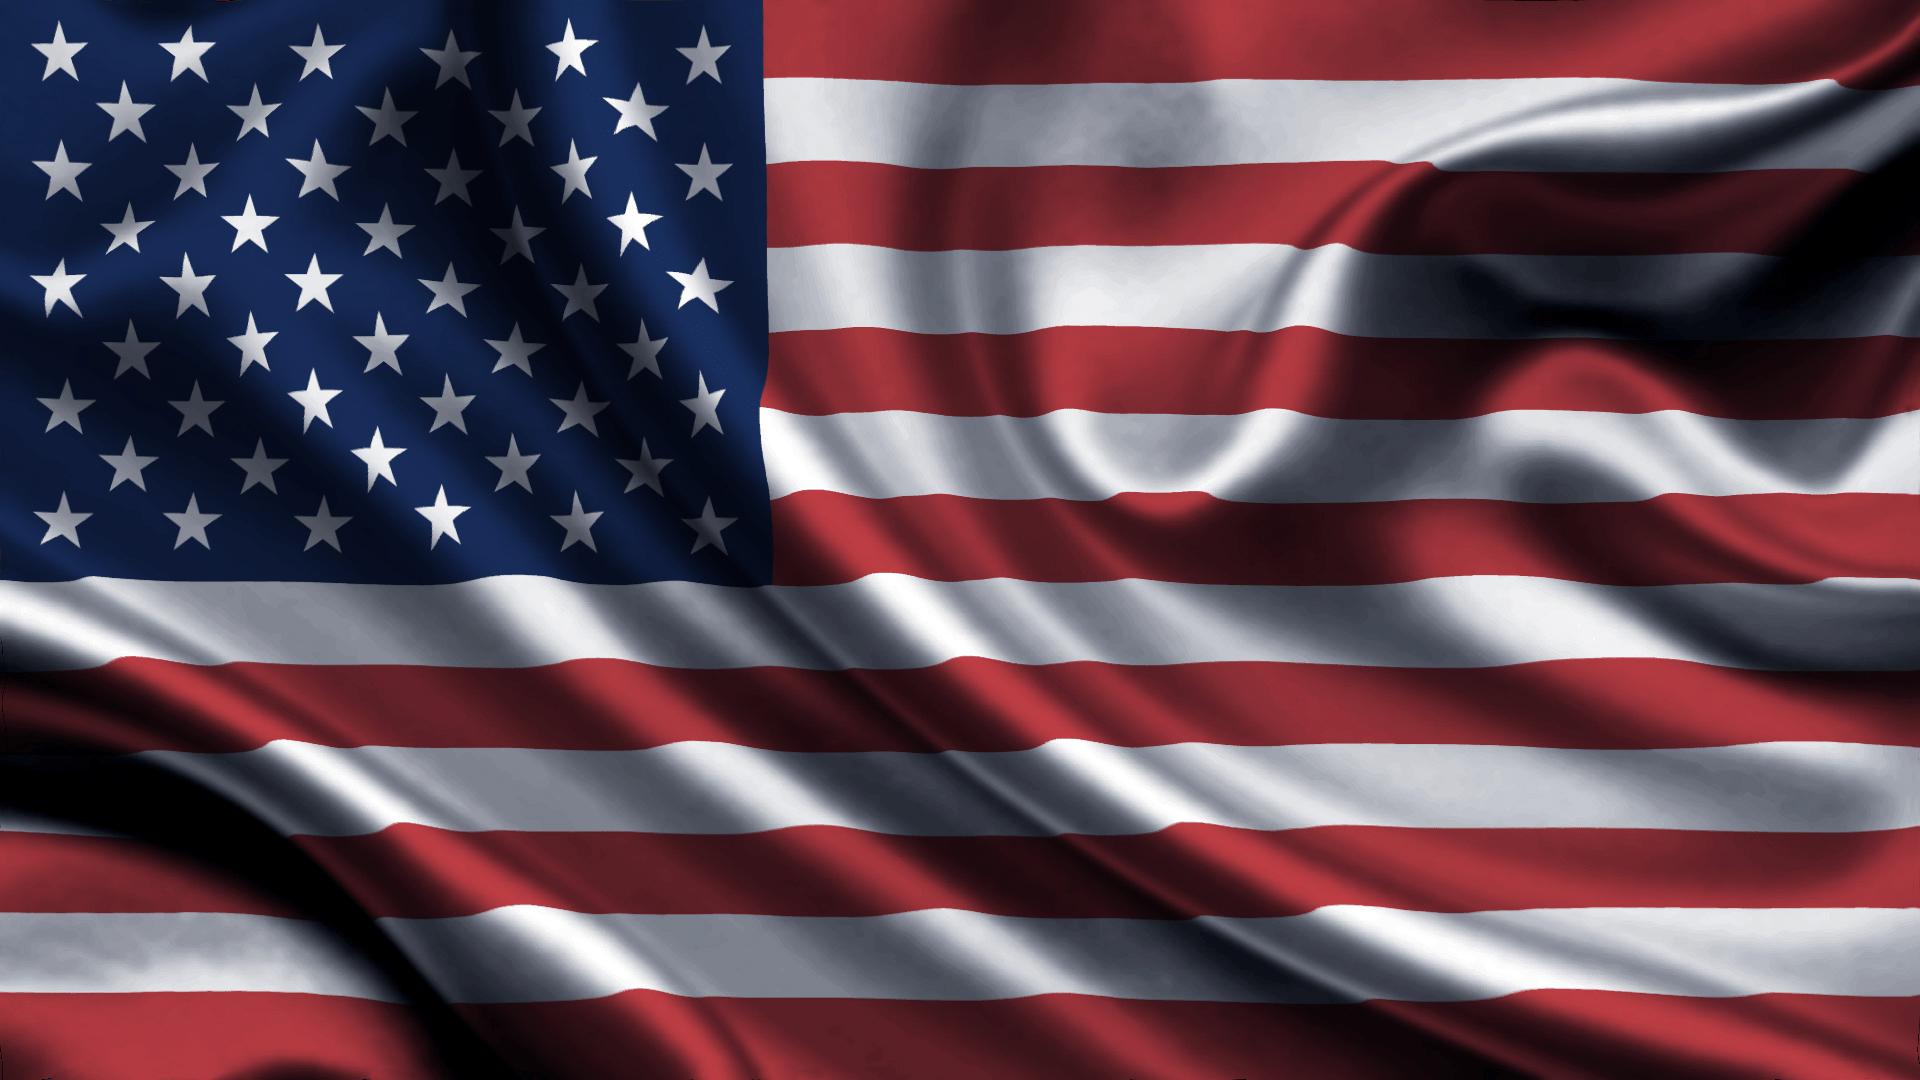 Free Fall Widescreen Wallpaper American Flag Backgrounds Pixelstalk Net